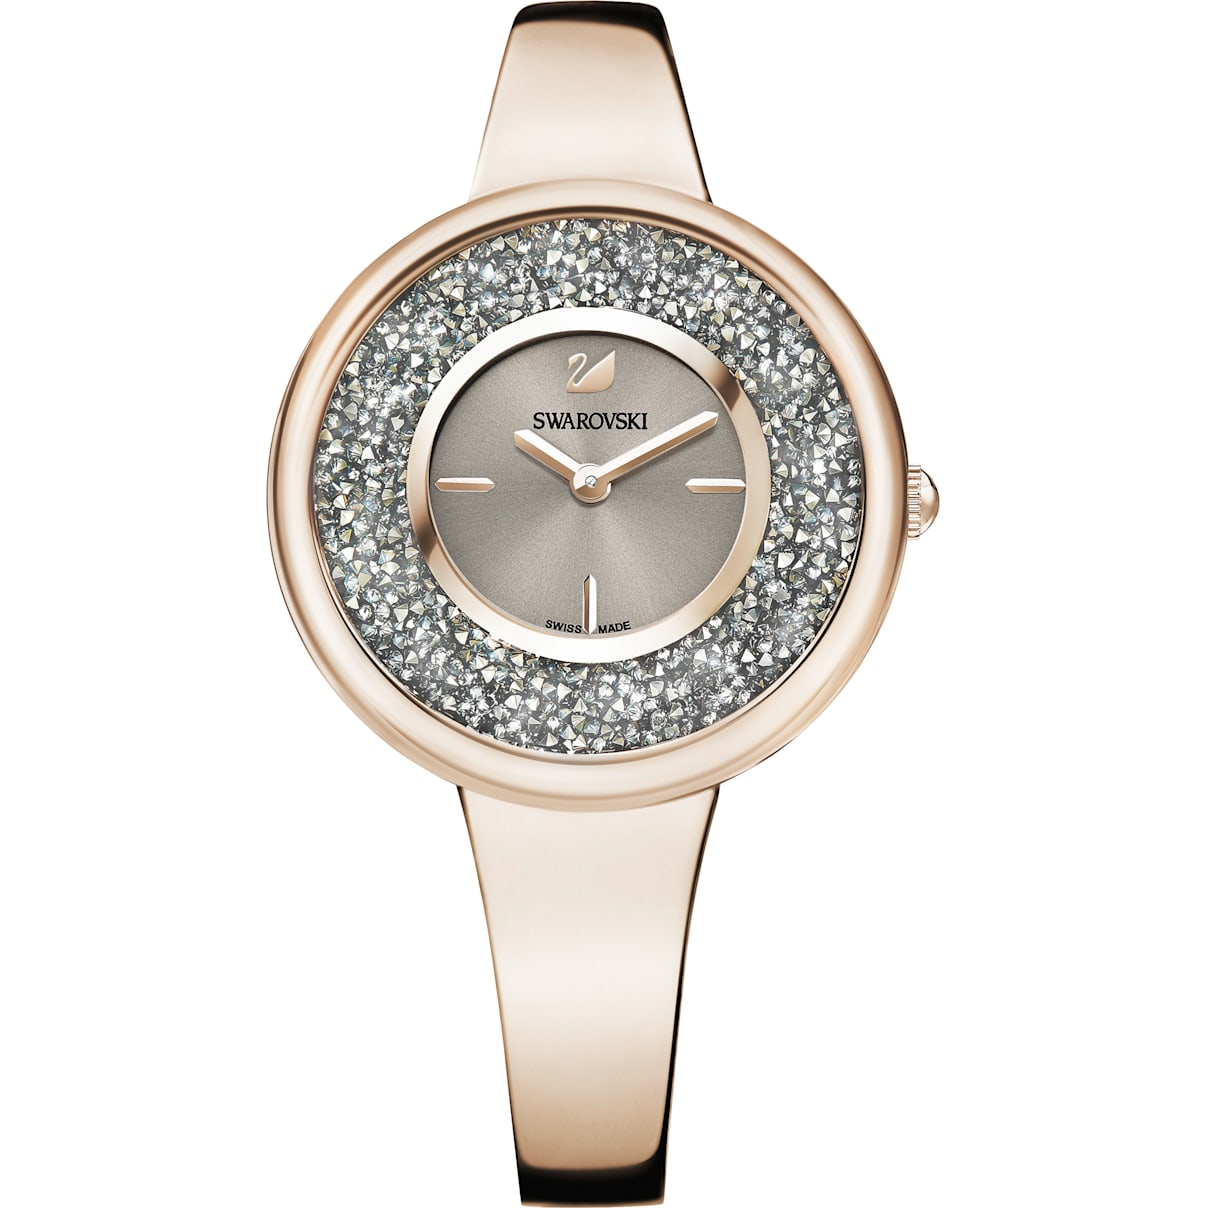 Swarovski Crystalline Pure Watch, Metal bracelet, Champagne-gold tone PVD